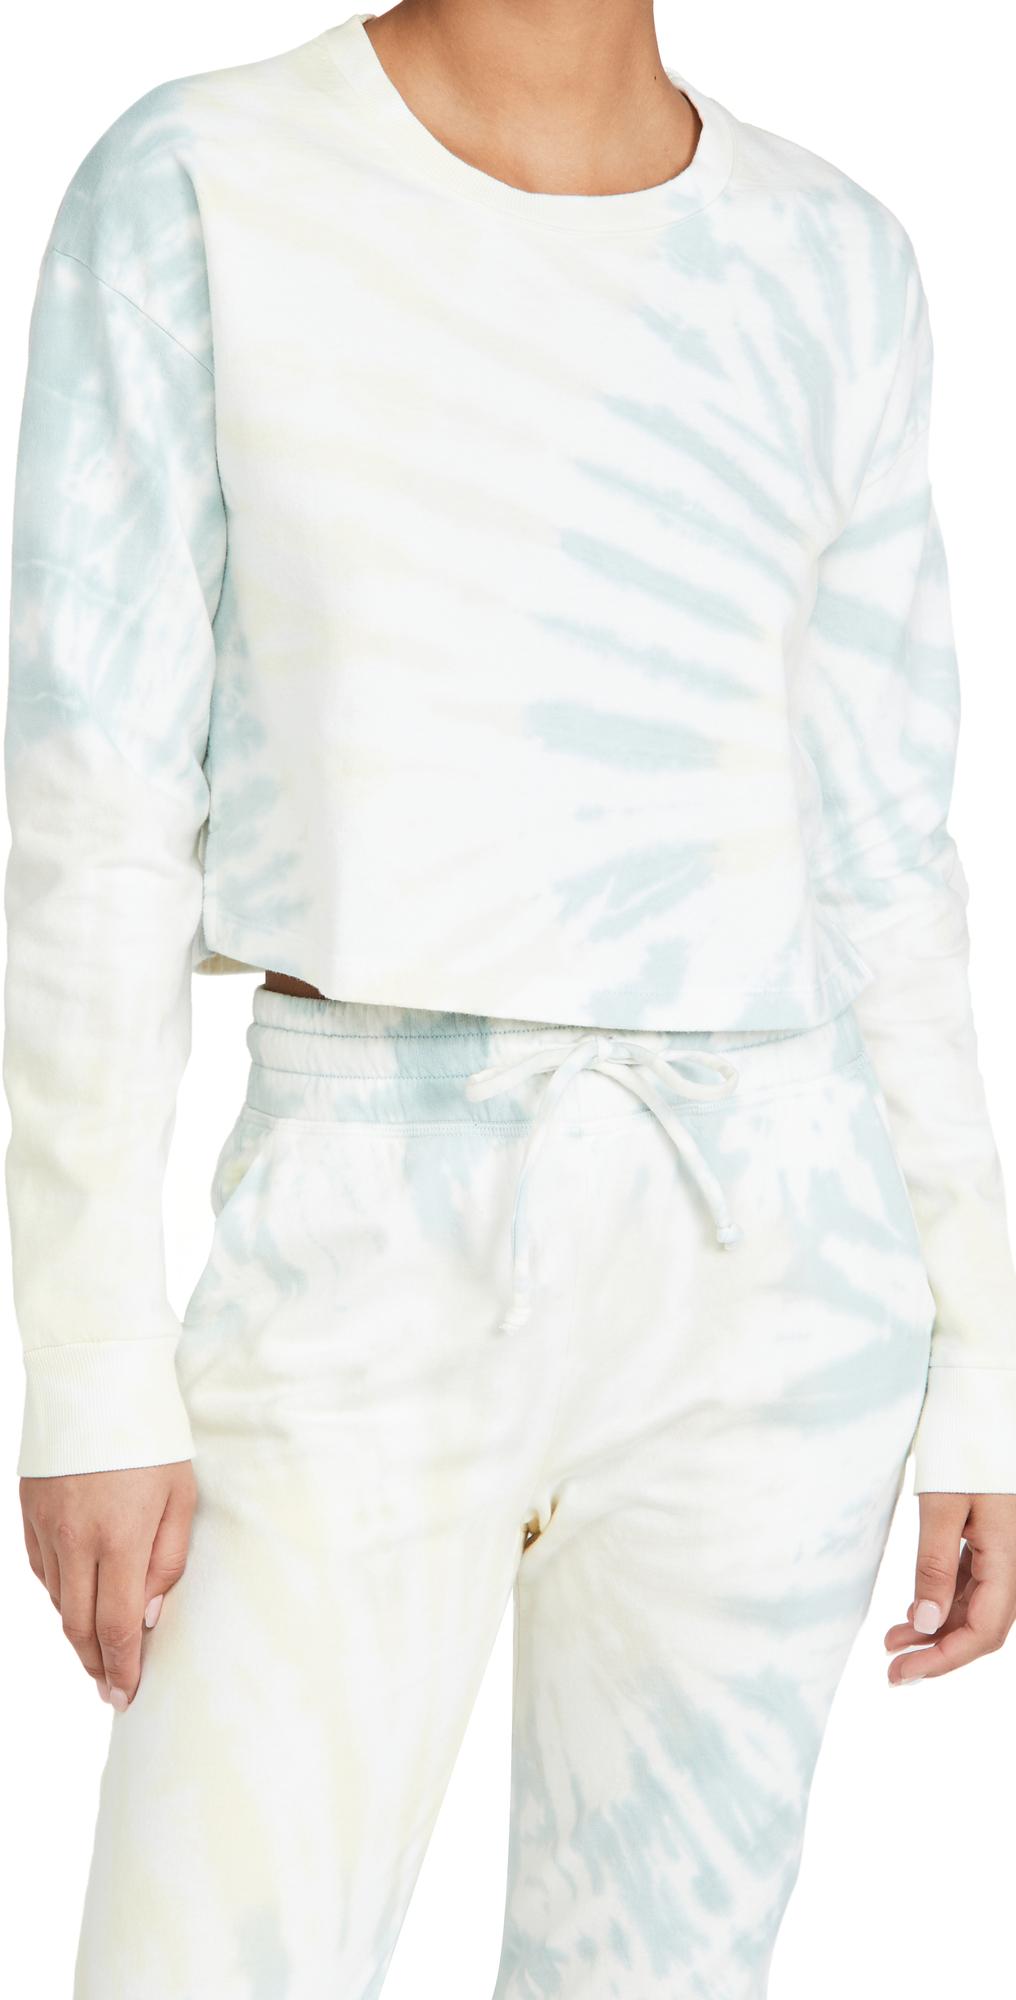 Beyond Yoga Weekend Boxy Cropped Pullover Sweatshirt